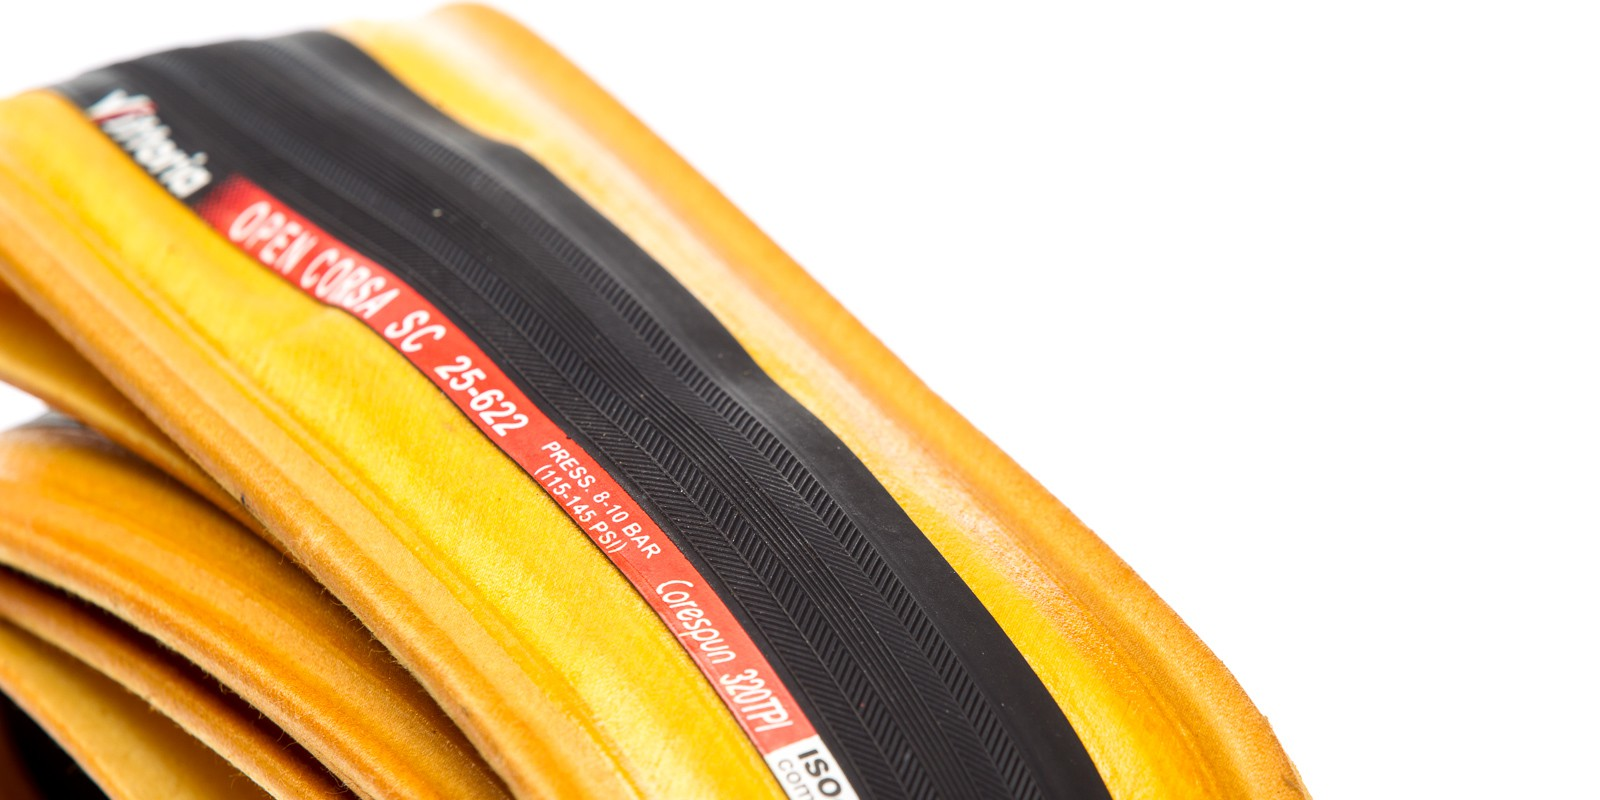 Vittoria Open Corsa SC II 25c Clincher